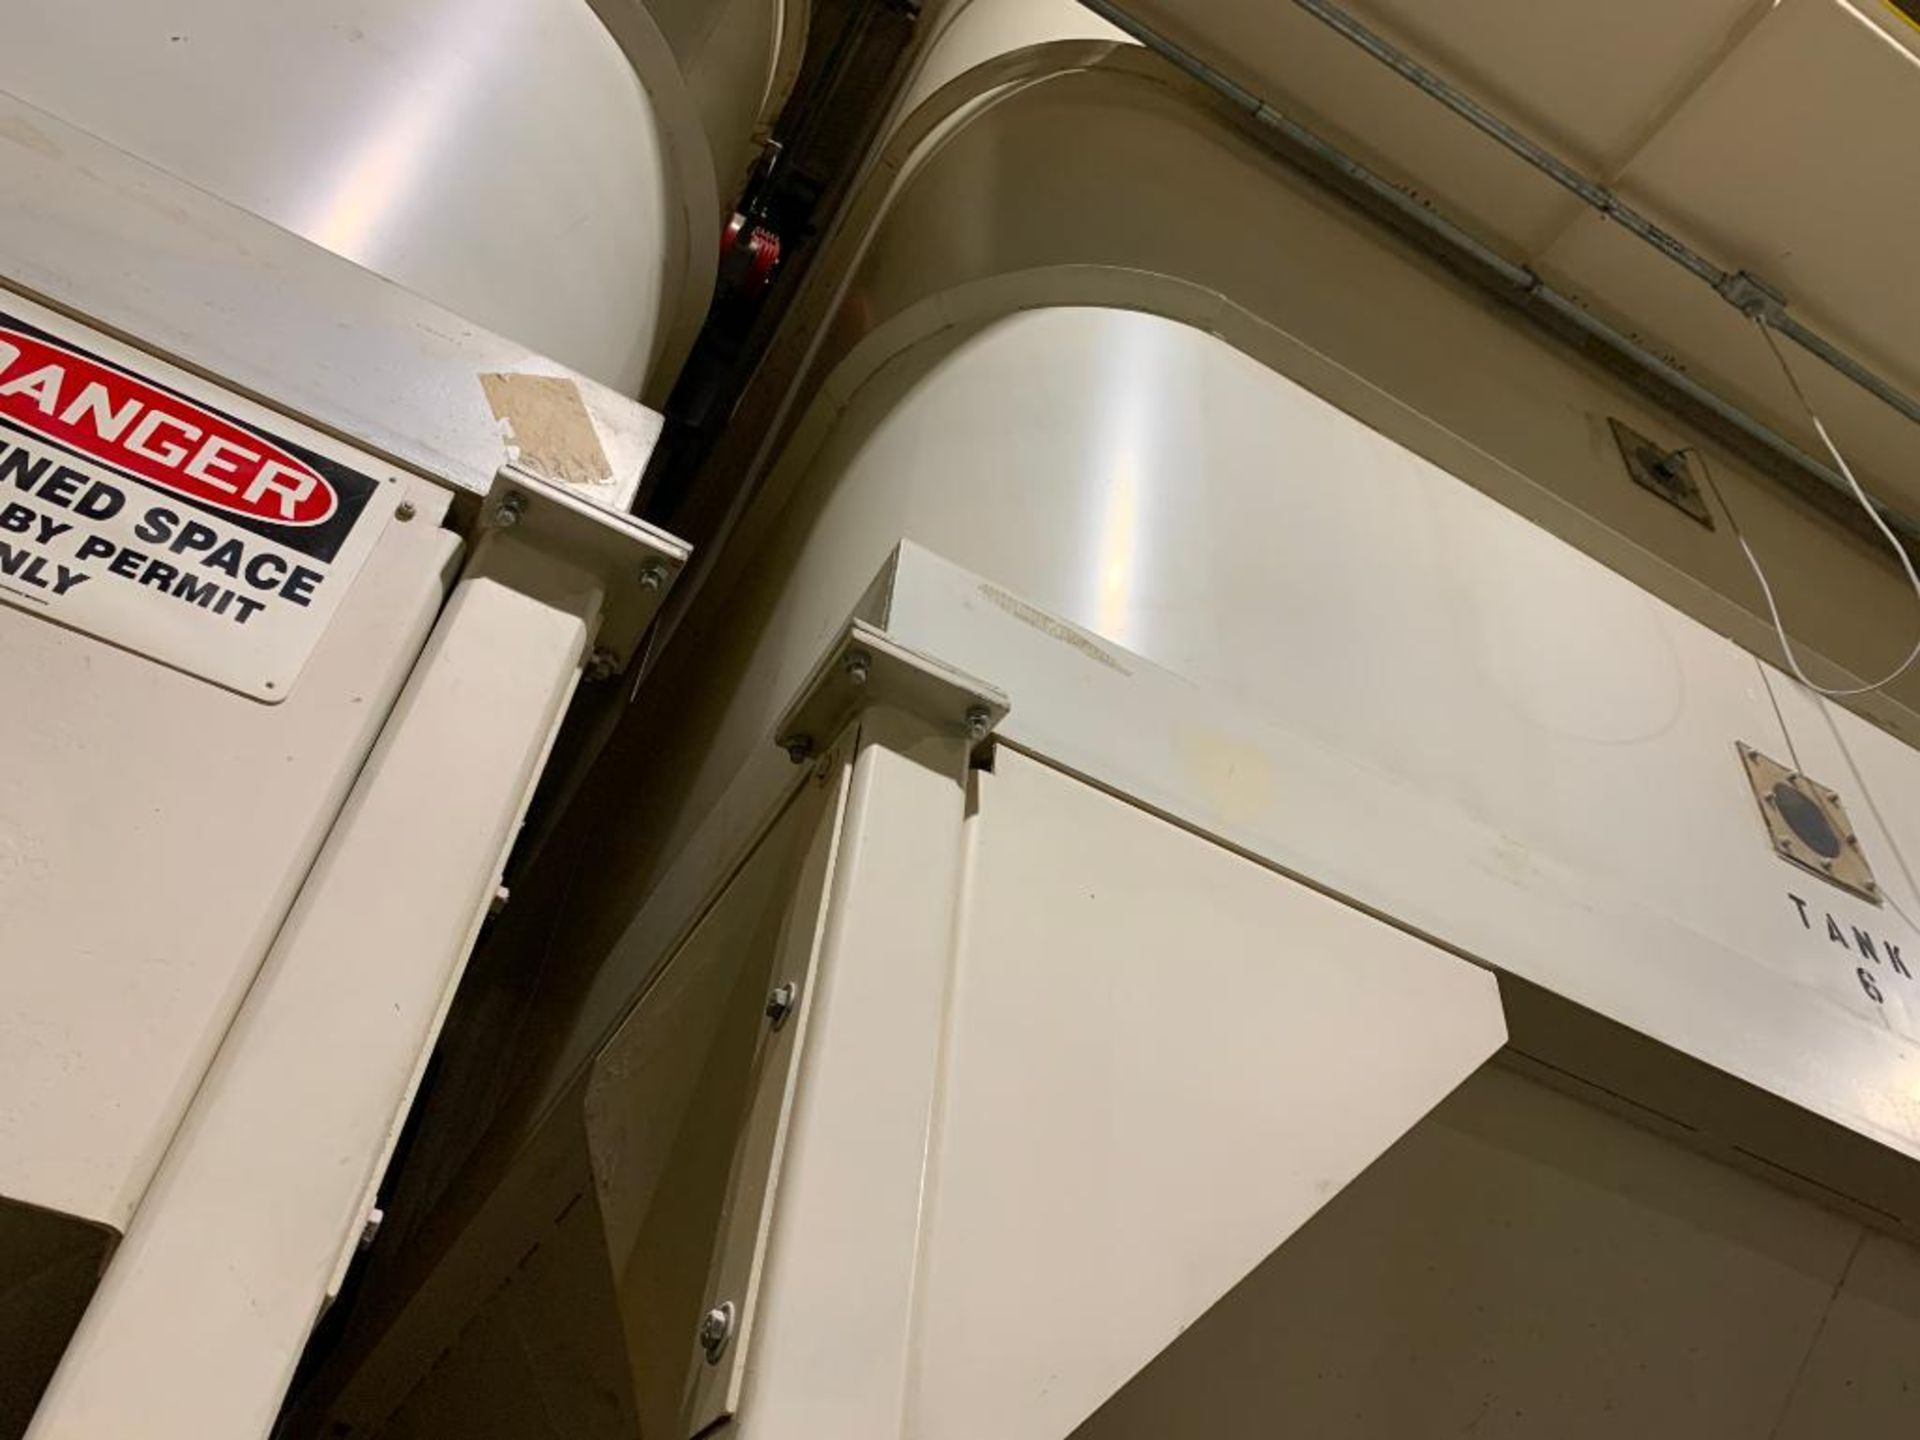 Aseeco mild steel cone bottom bulk storage bin - Image 14 of 27